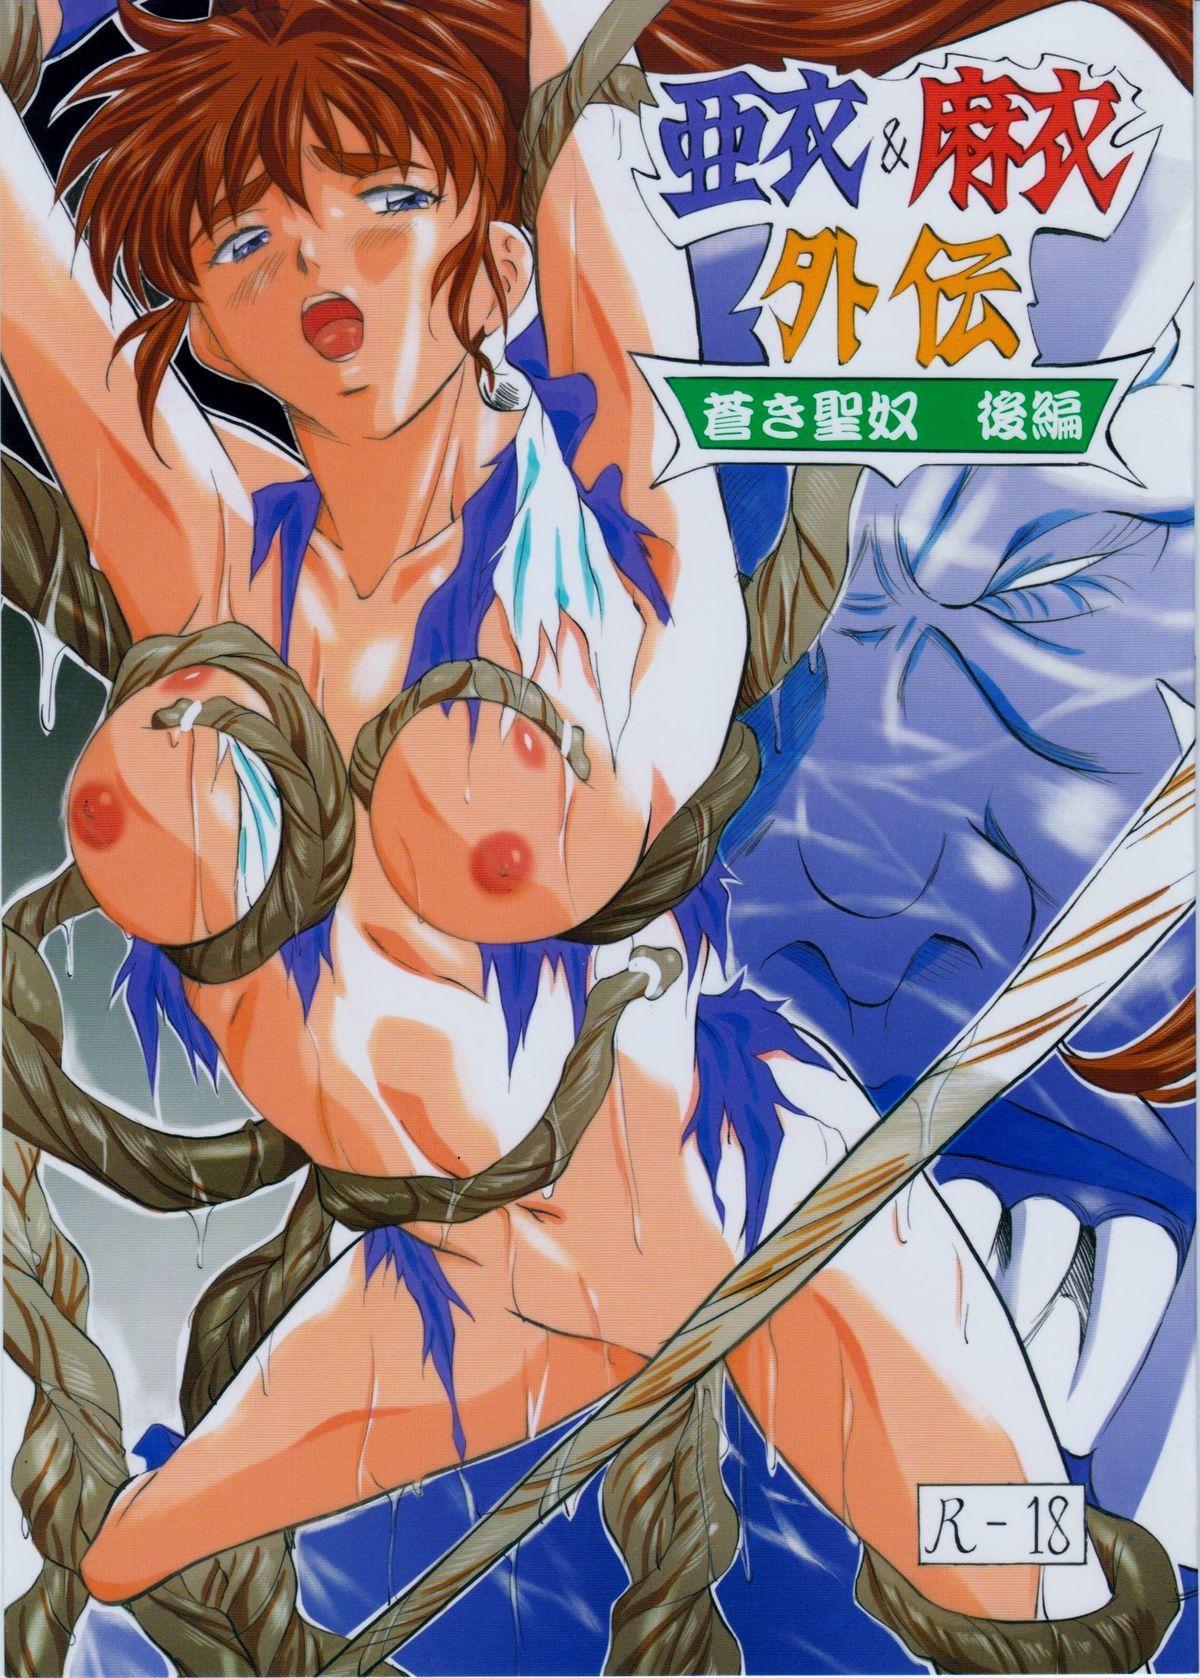 [Busou Megami (Kannaduki Kanna)] Ai & Mai Gaiden -Aoki Seido-Kouhen- (Inju Seisen Twin Angels) 0